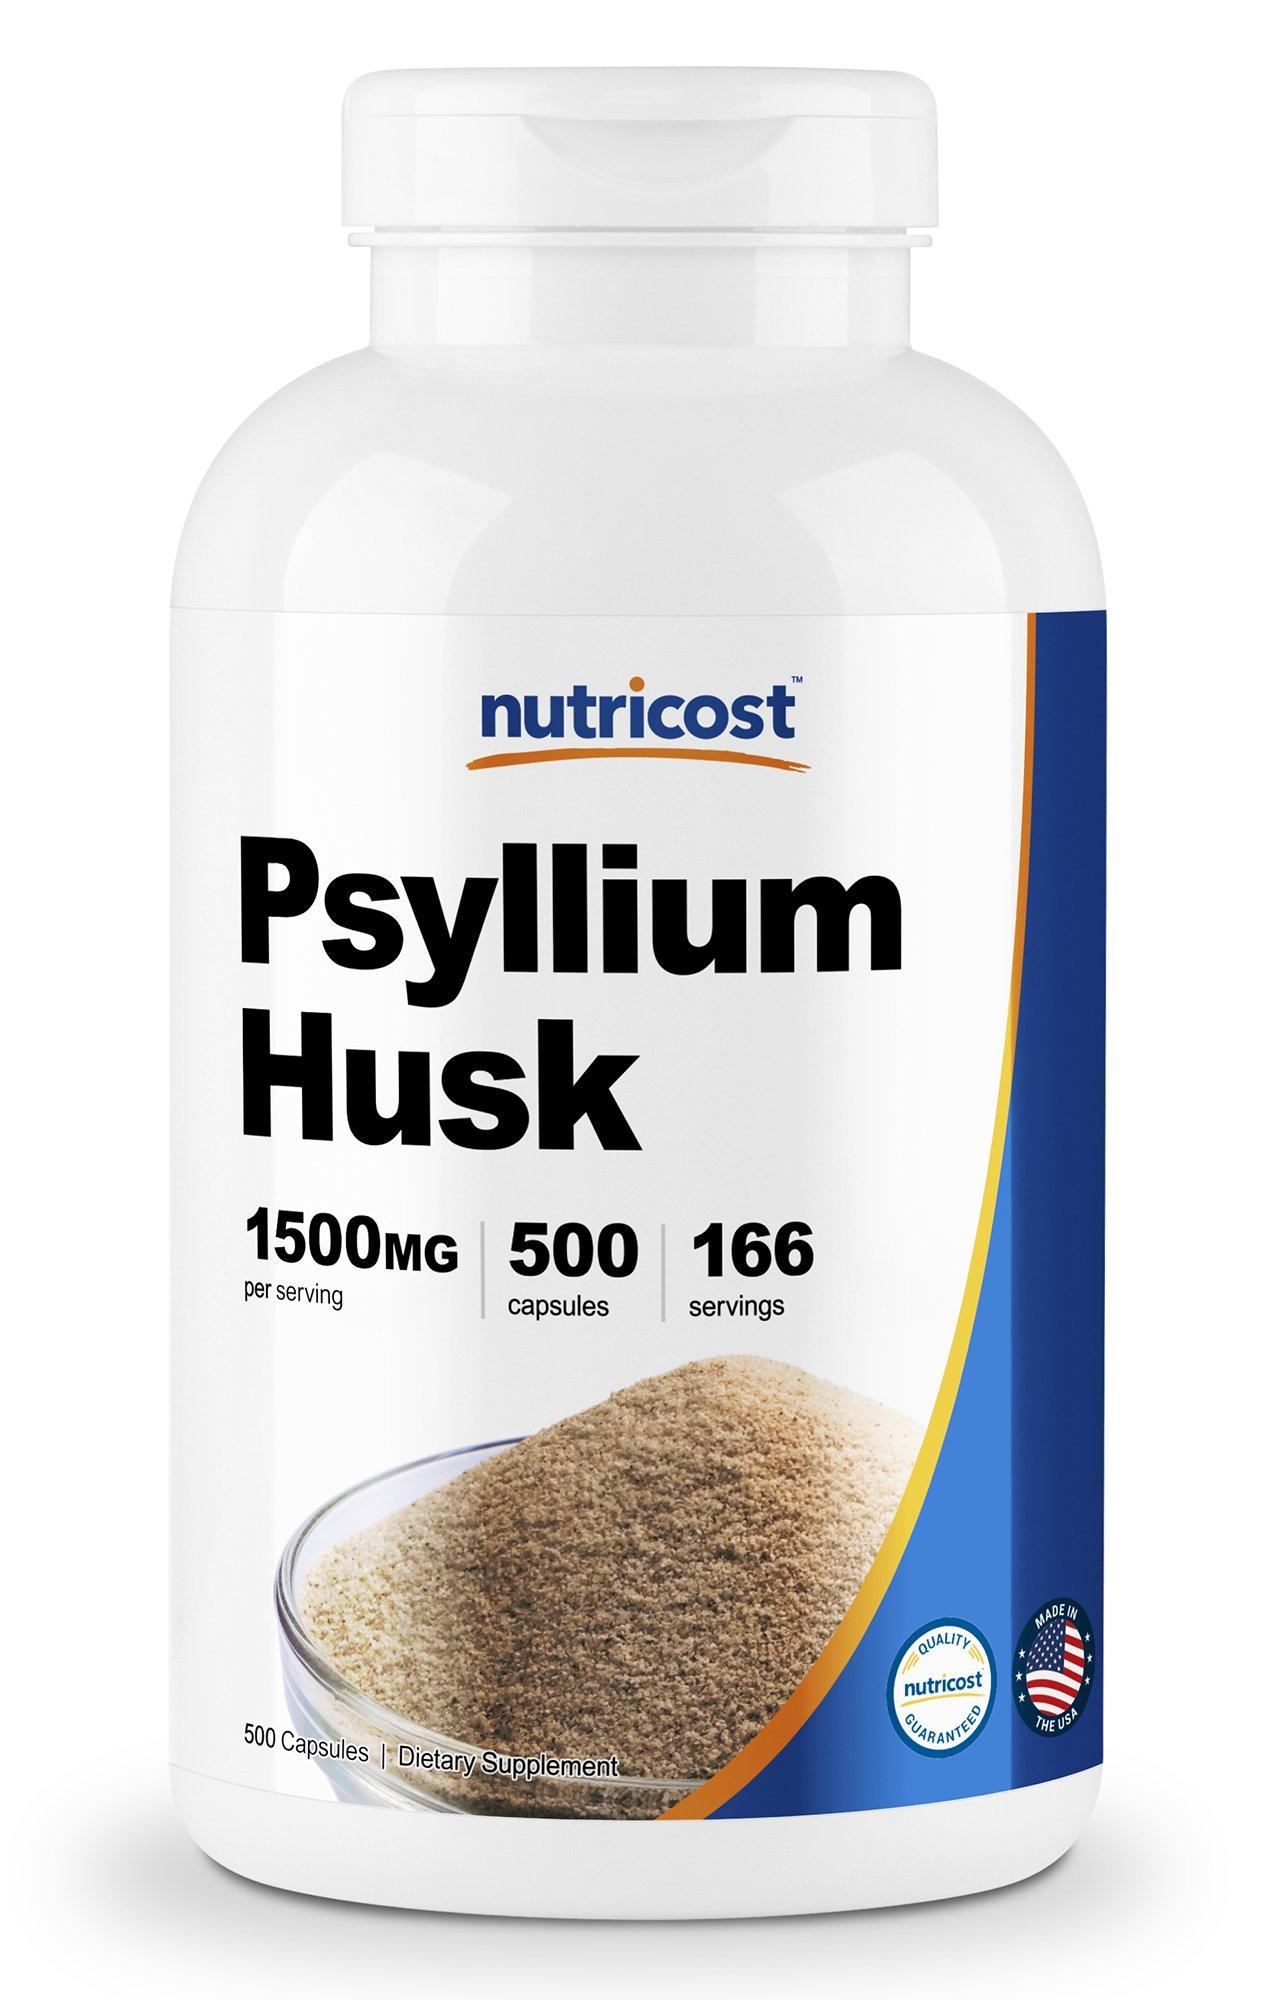 Nutricost Psyllium Husk 500mg, 500 Capsules - 1500mg Per Serving, Non-GMO & Gluten Free by Nutricost